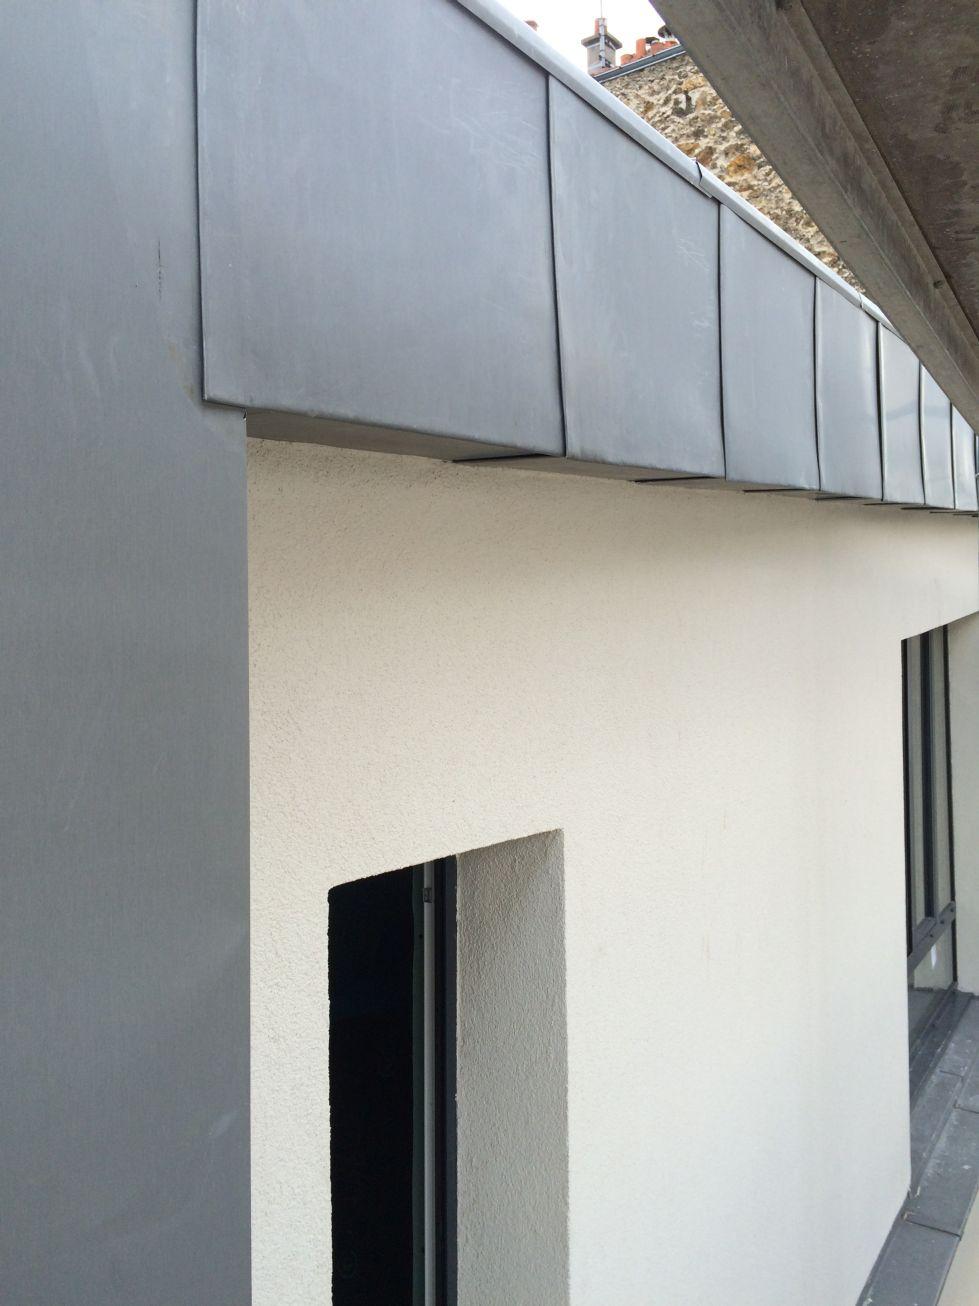 08_detail facade.JPG